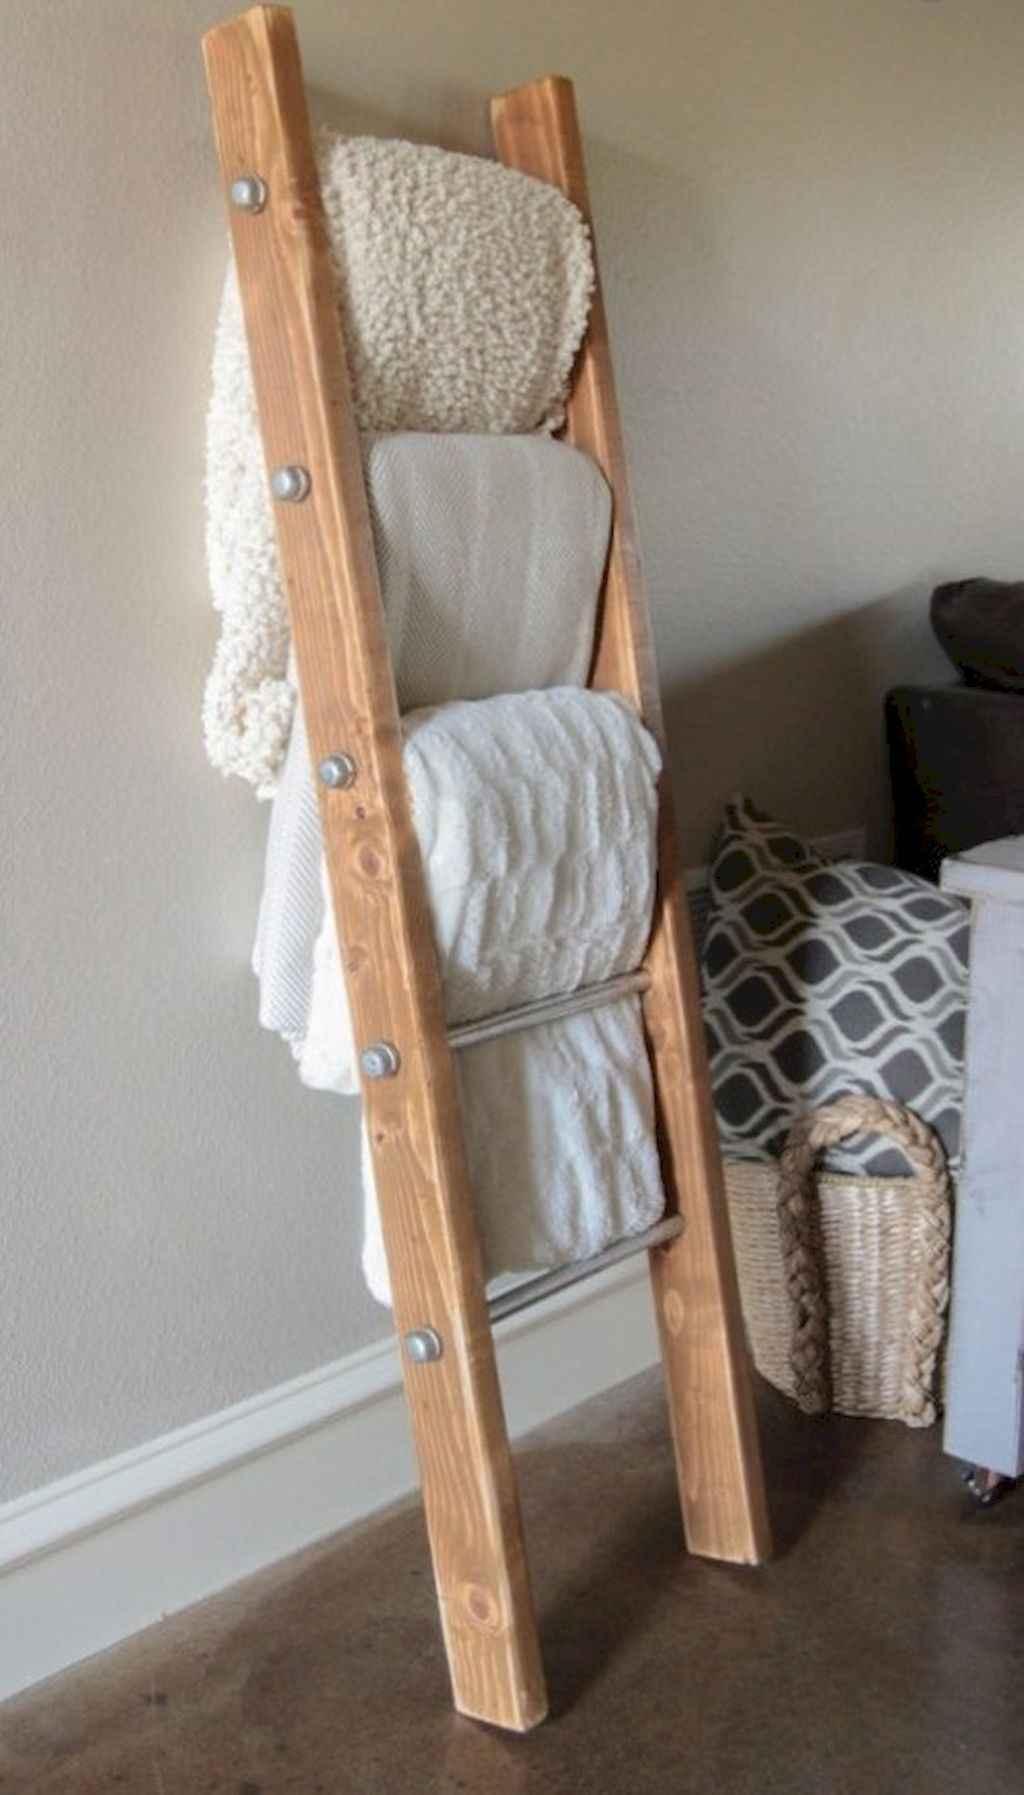 Small apartment decorating ideas (41)